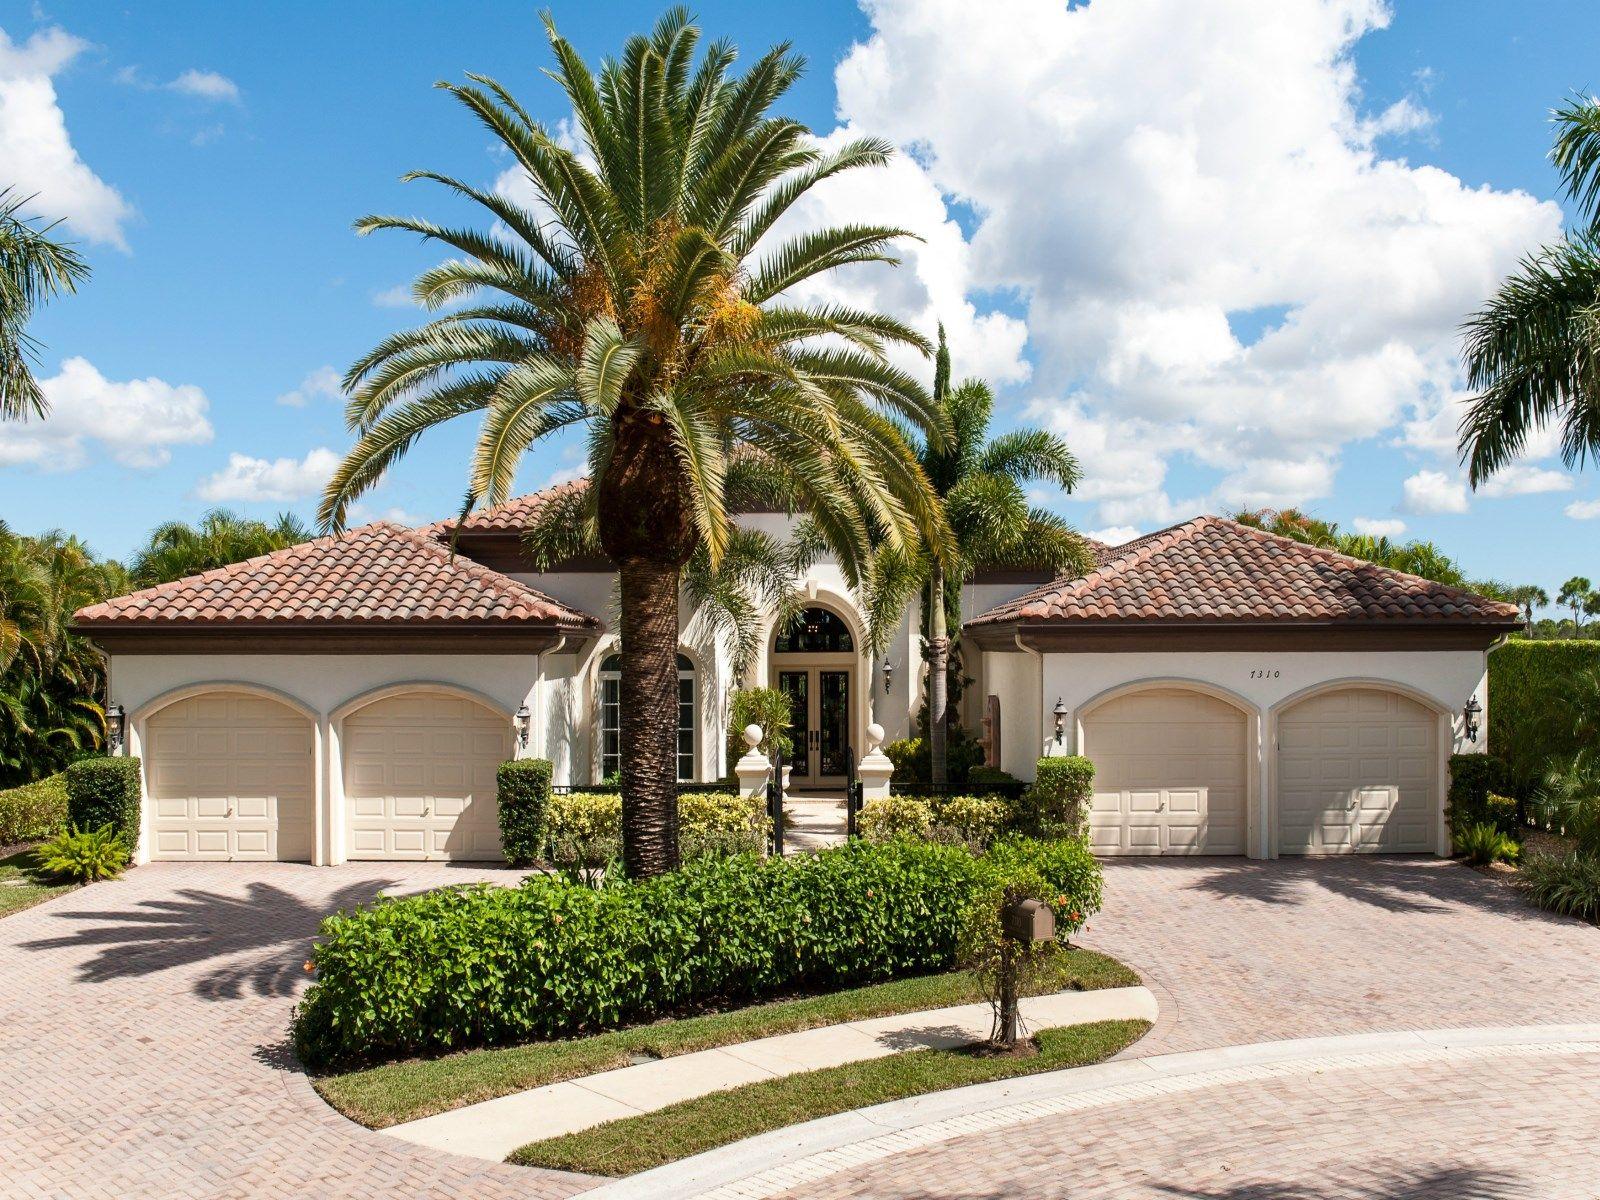 7310 Winding Bay Ln West Palm Beach, FL, 33412 Palm